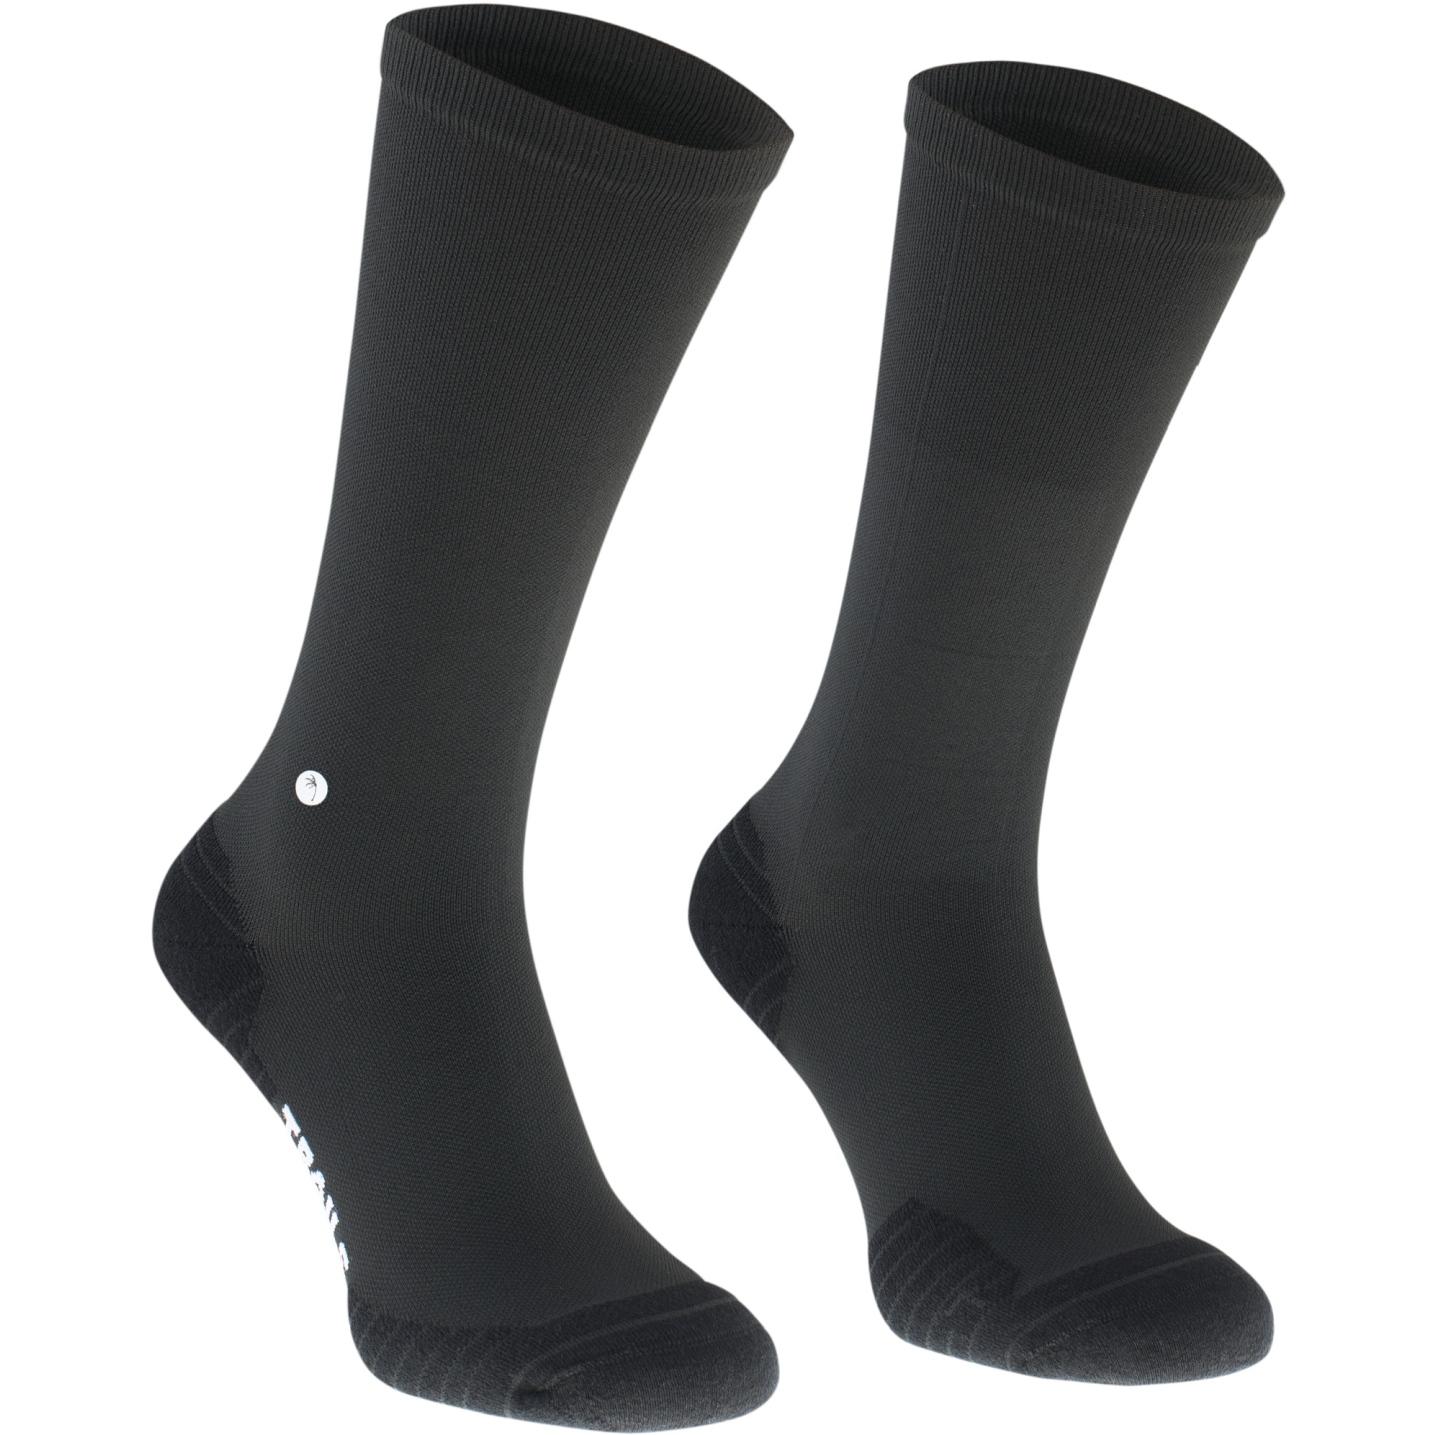 ION Bike Unisex Socks Long - Black